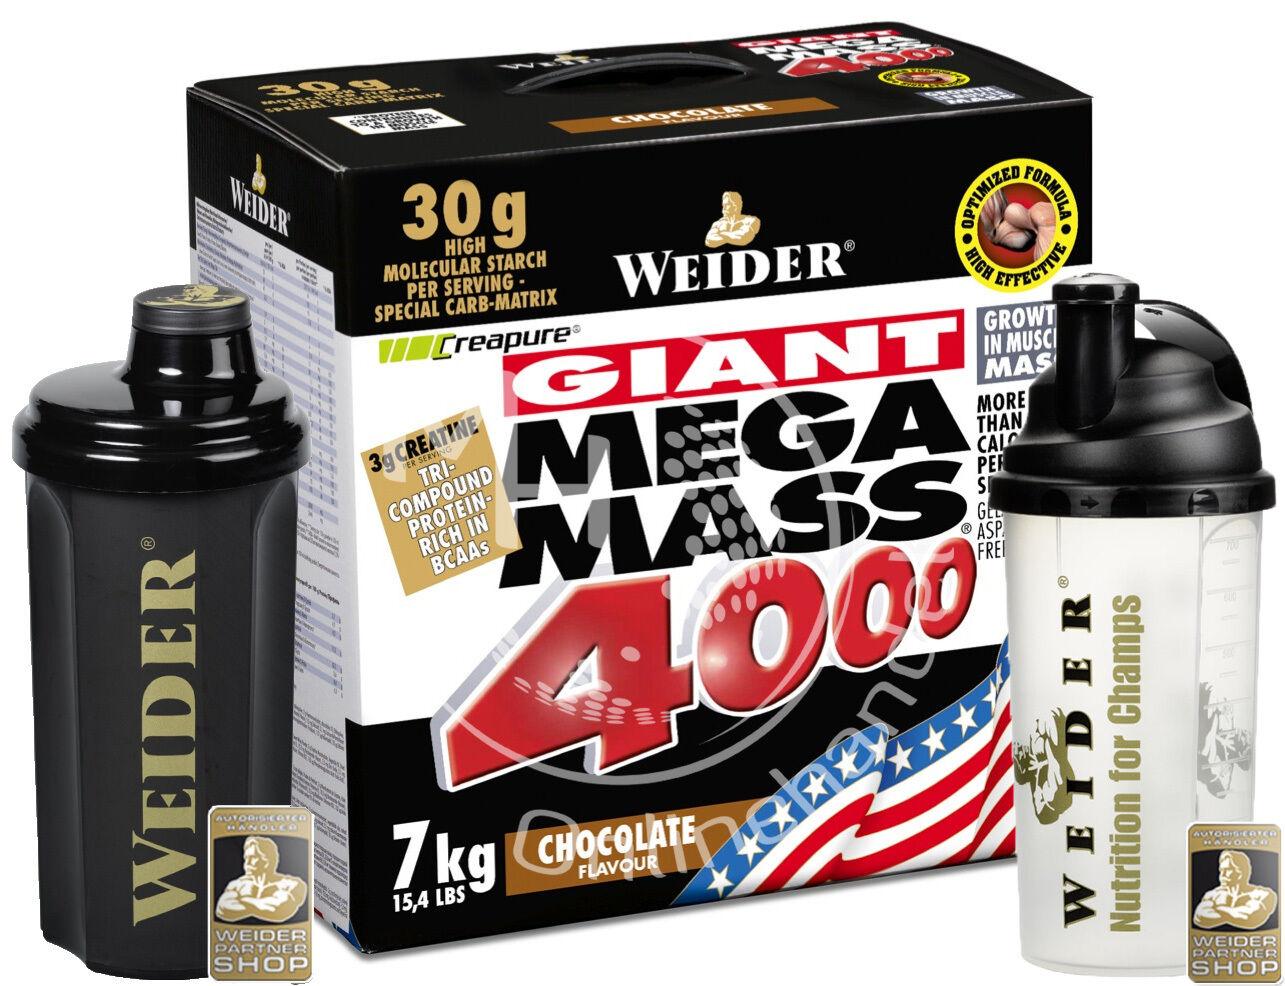 Weider Mega Mass 4000 ( /Kg) 7kg Karton +SHAKER CREAPURE   Hardgainer CREAPURE +SHAKER 70113c